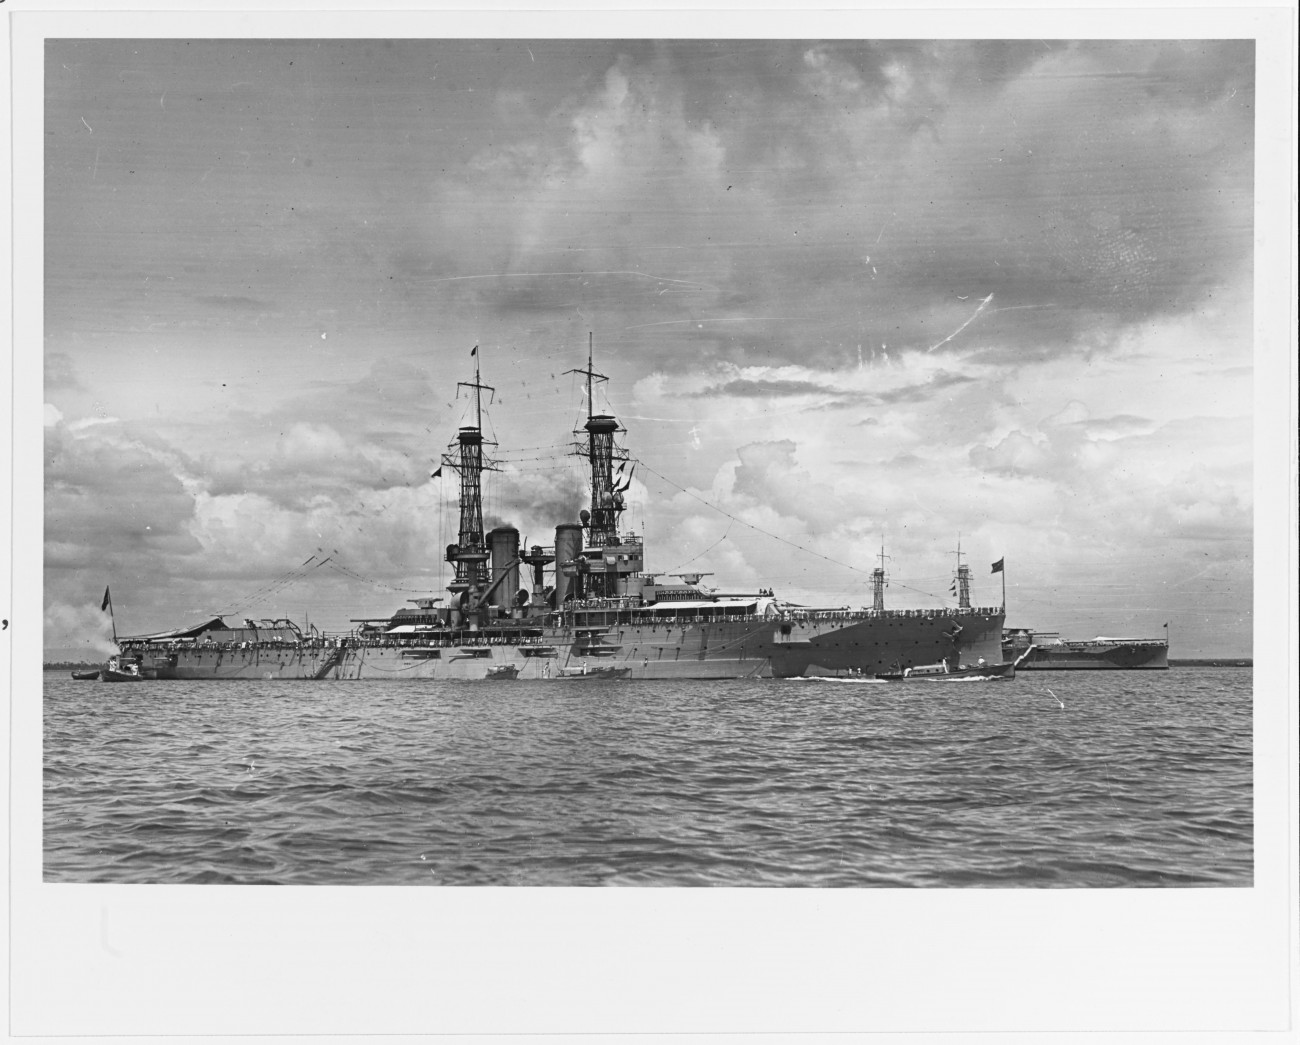 Battleship Number 31, USS Utah, at rest in Guatanamo Bay, Cuba, January 1920.